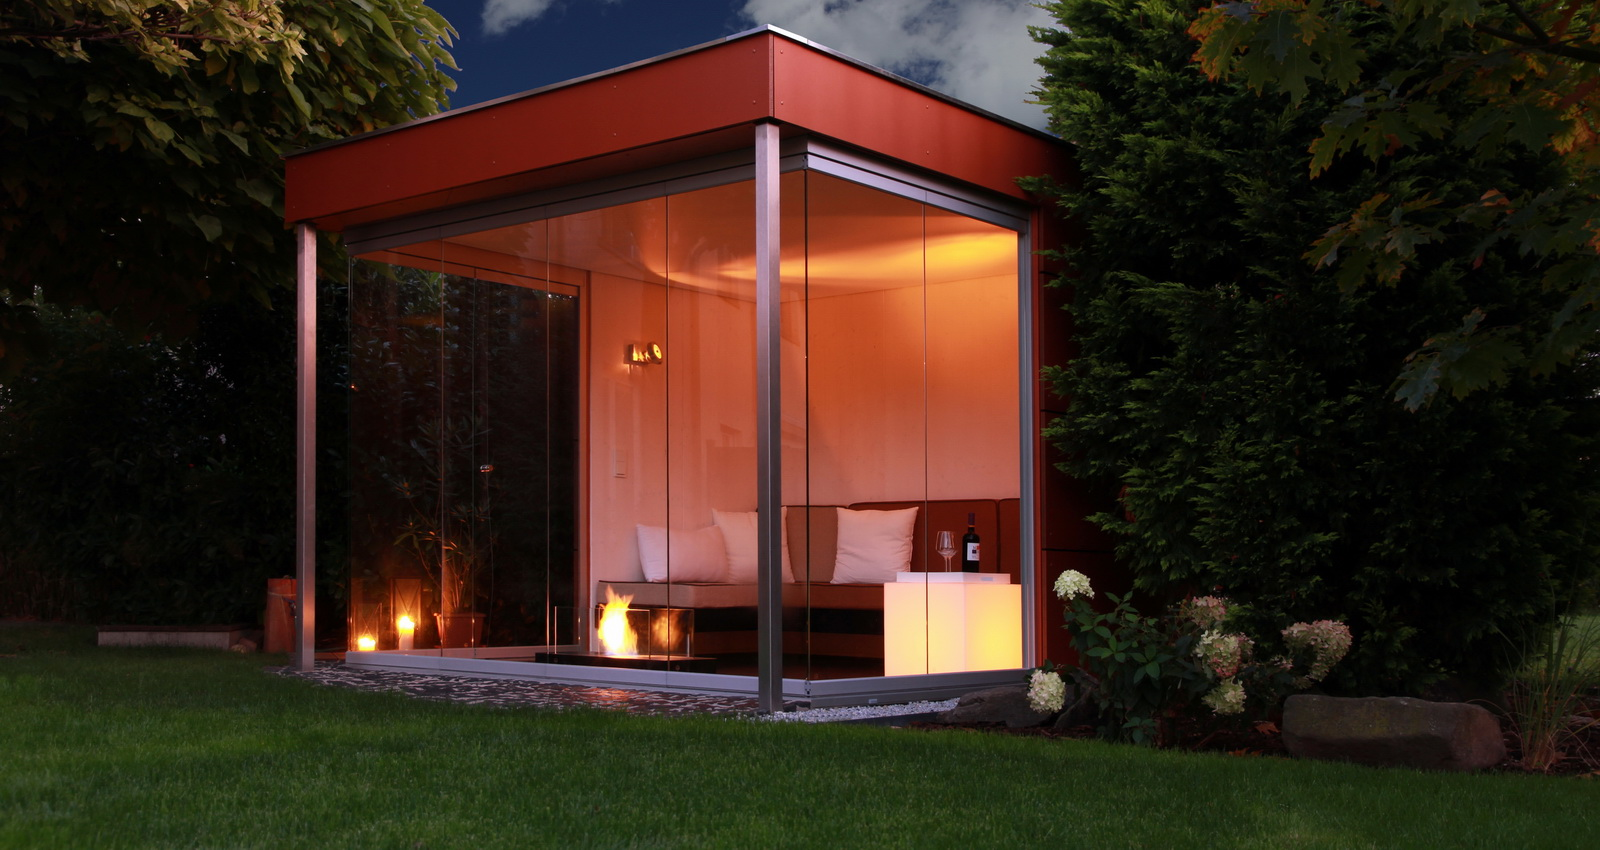 design gartenhaus moderne gartenh user schicke gartensauna auch alsbausatz. Black Bedroom Furniture Sets. Home Design Ideas